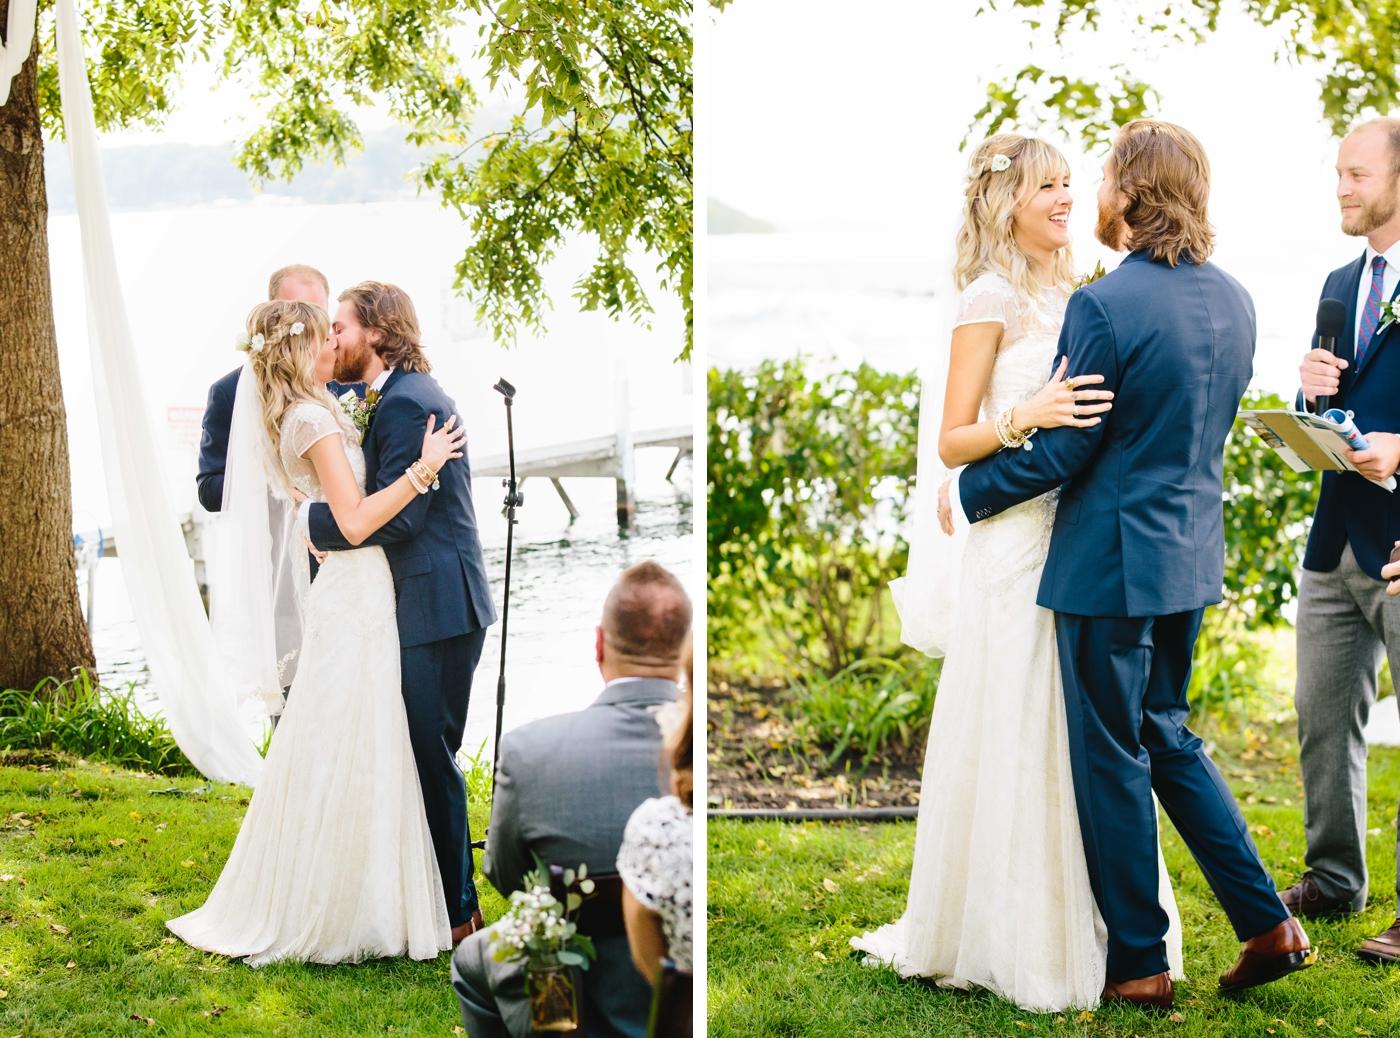 chicago-fine-art-wedding-photography-chriskelsey17